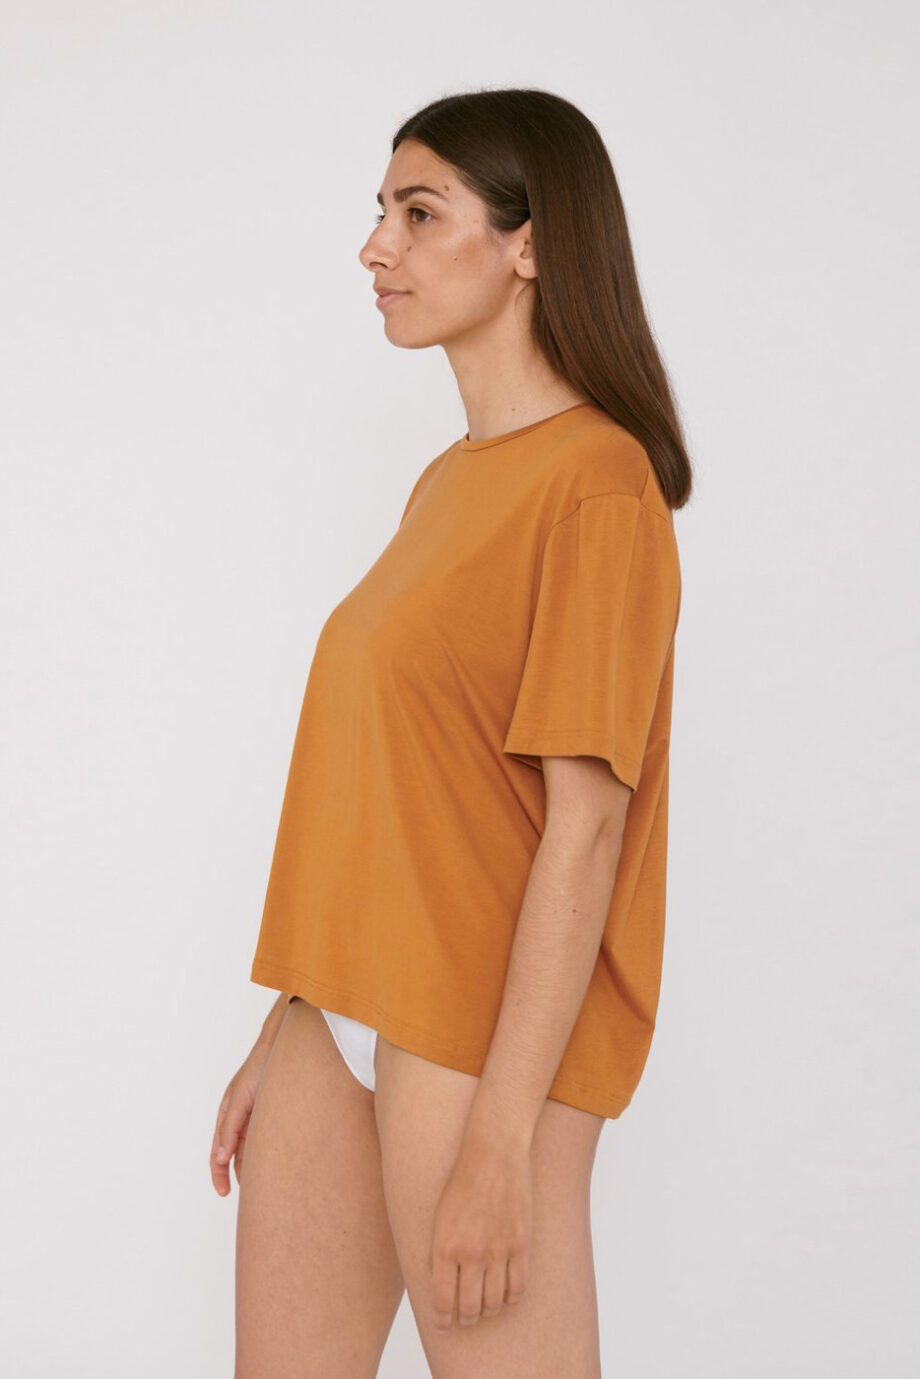 Organic Basics - T-shirt Tencel– geel_model